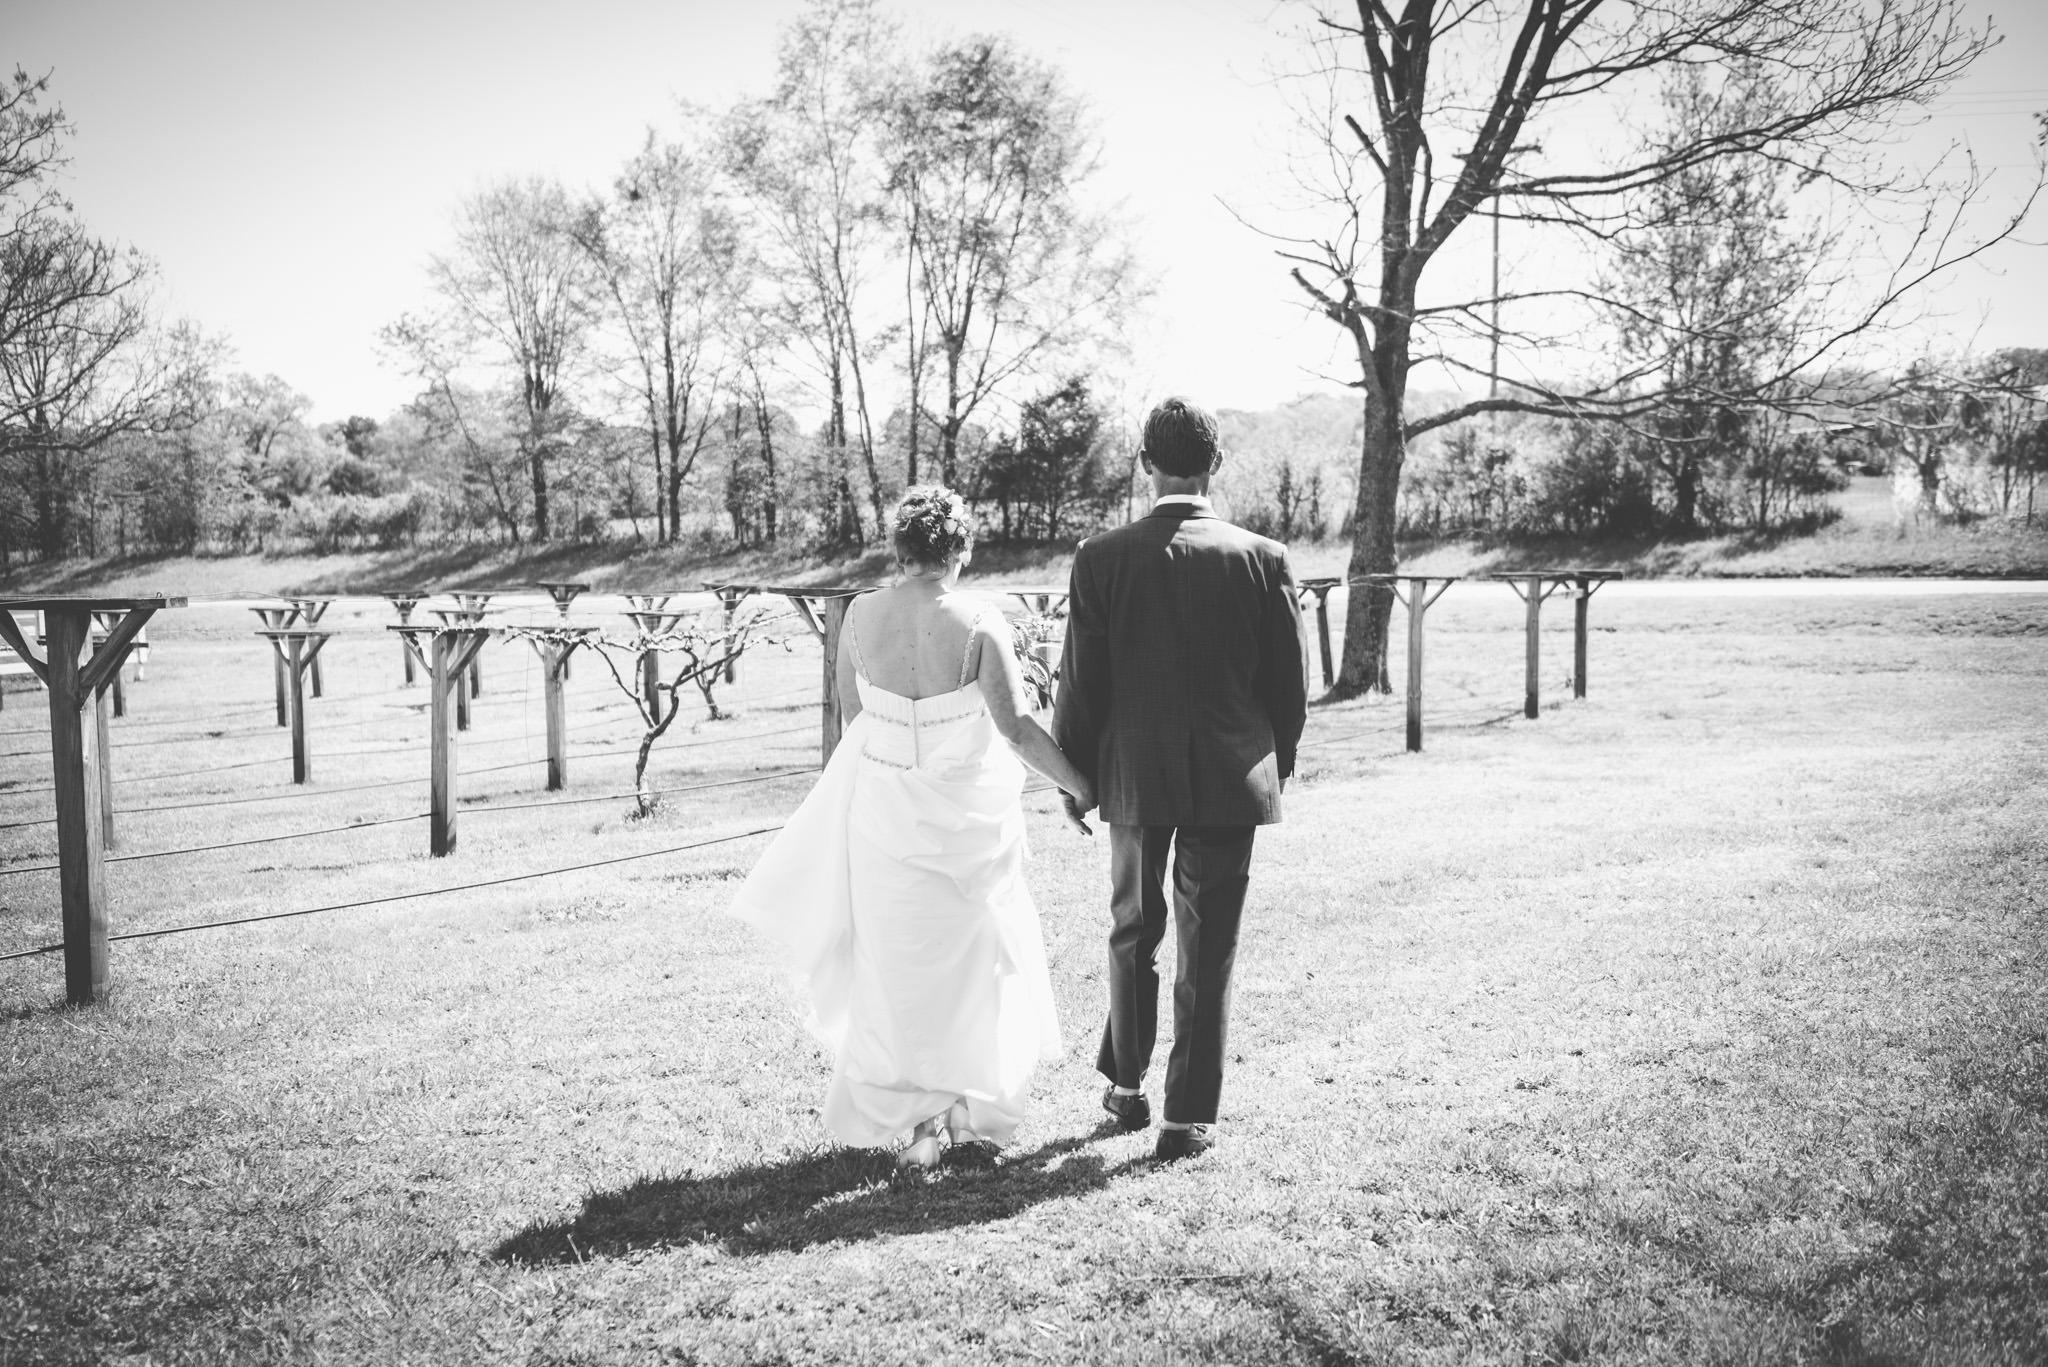 junebird-photography-wedding-photographer.jpg